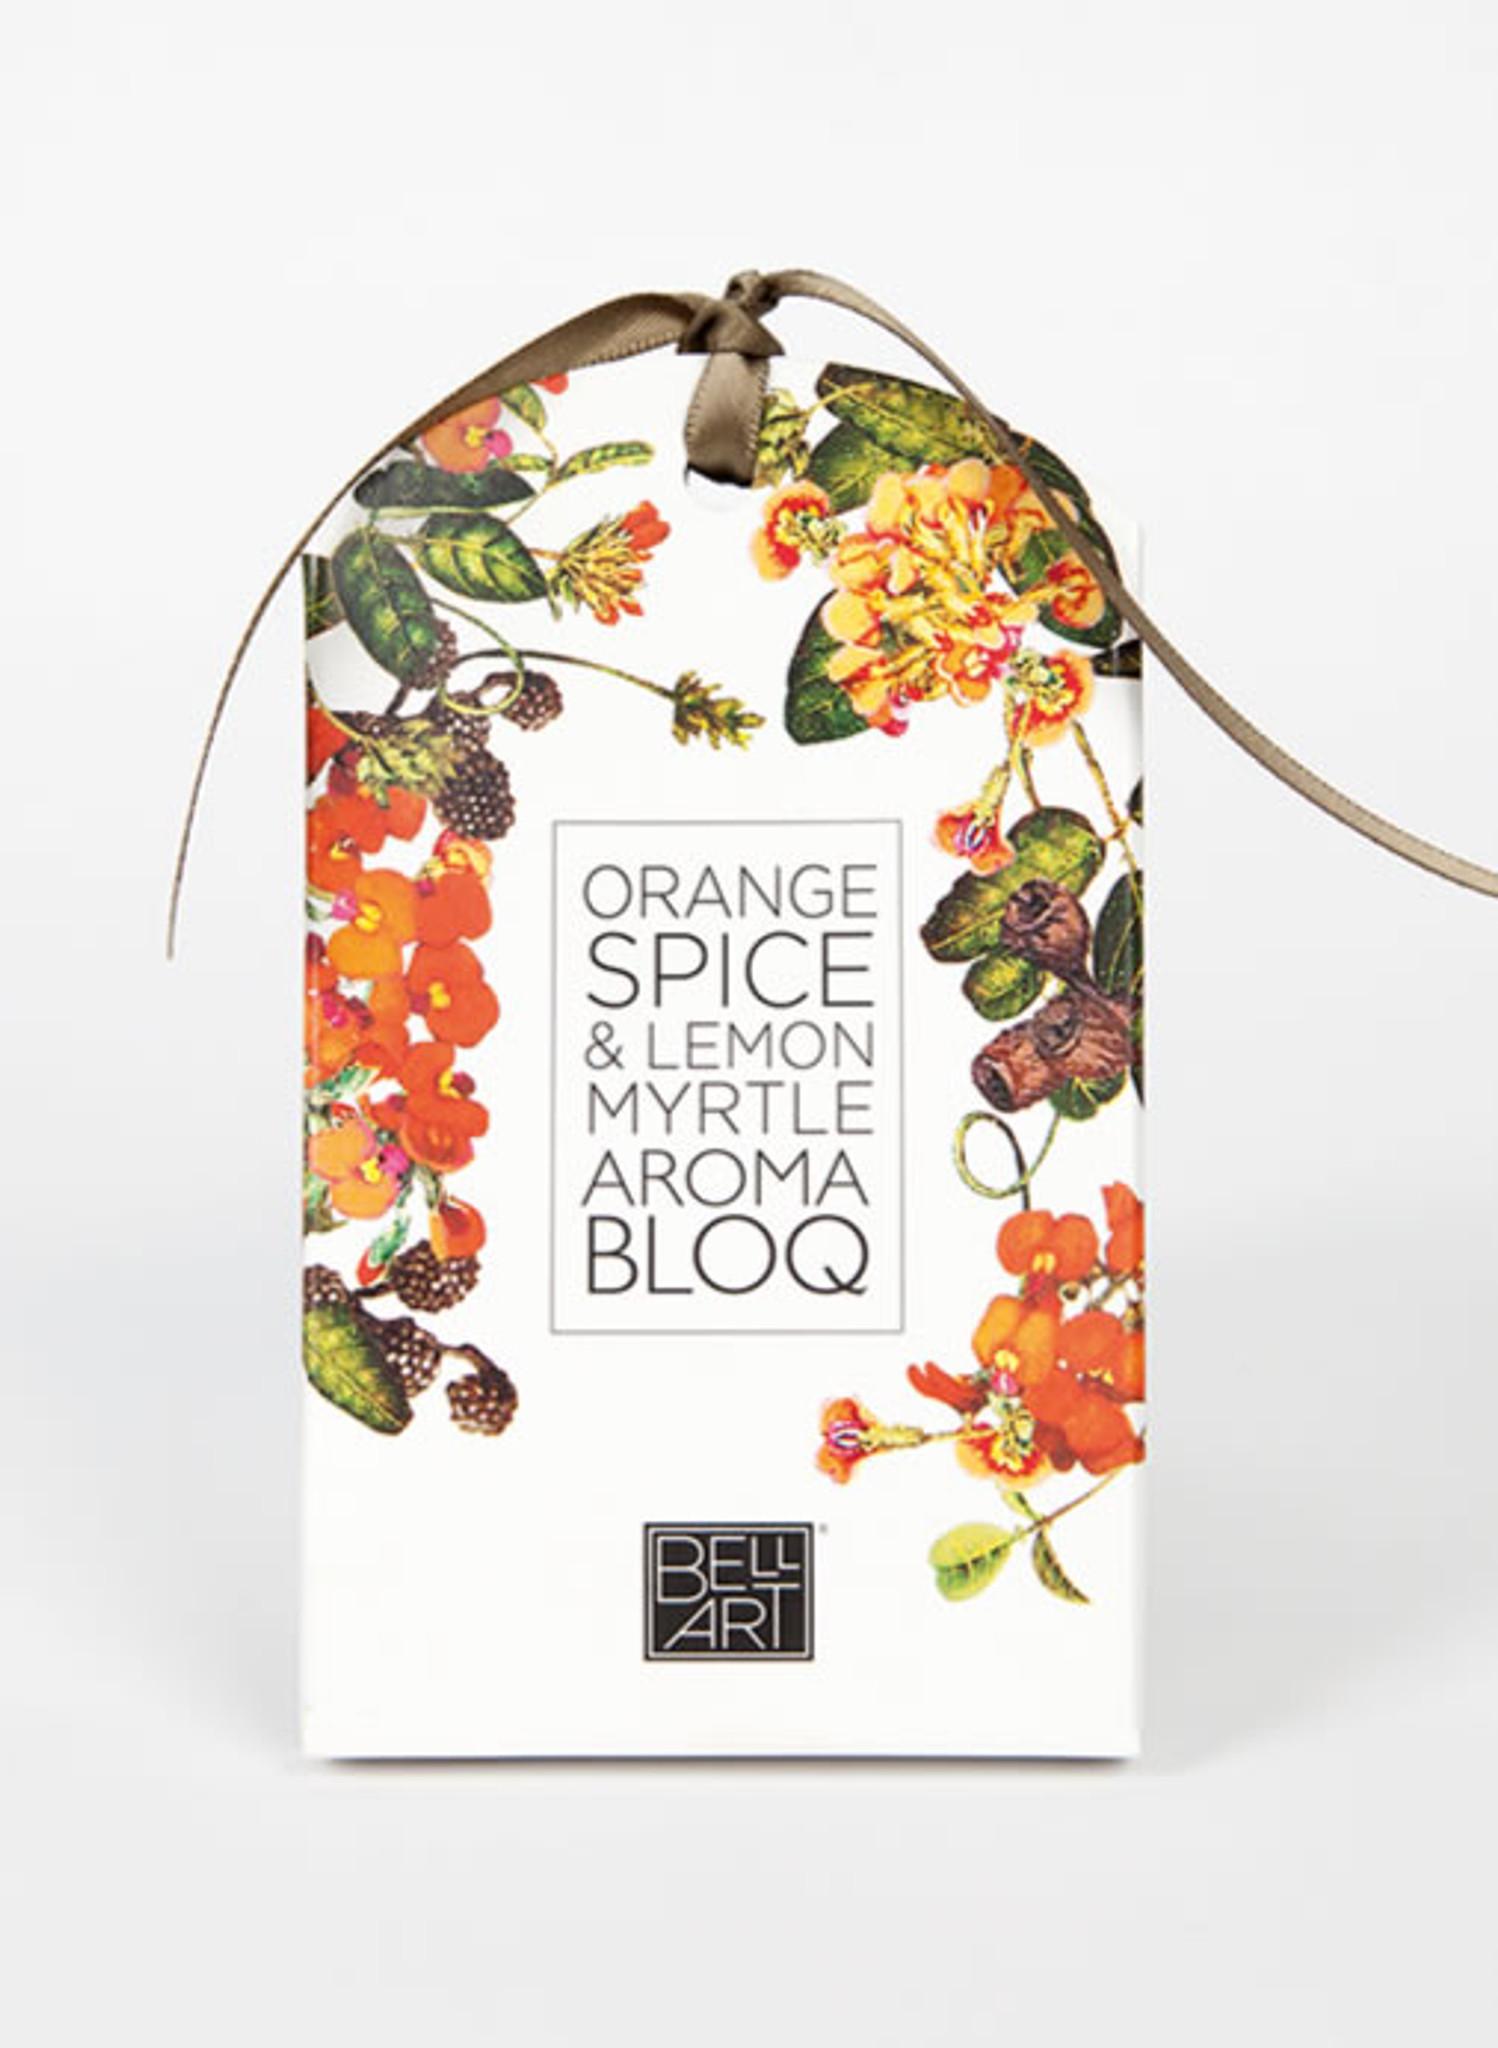 Aroma Bloq - Orange Spice & Lemon Myrtle